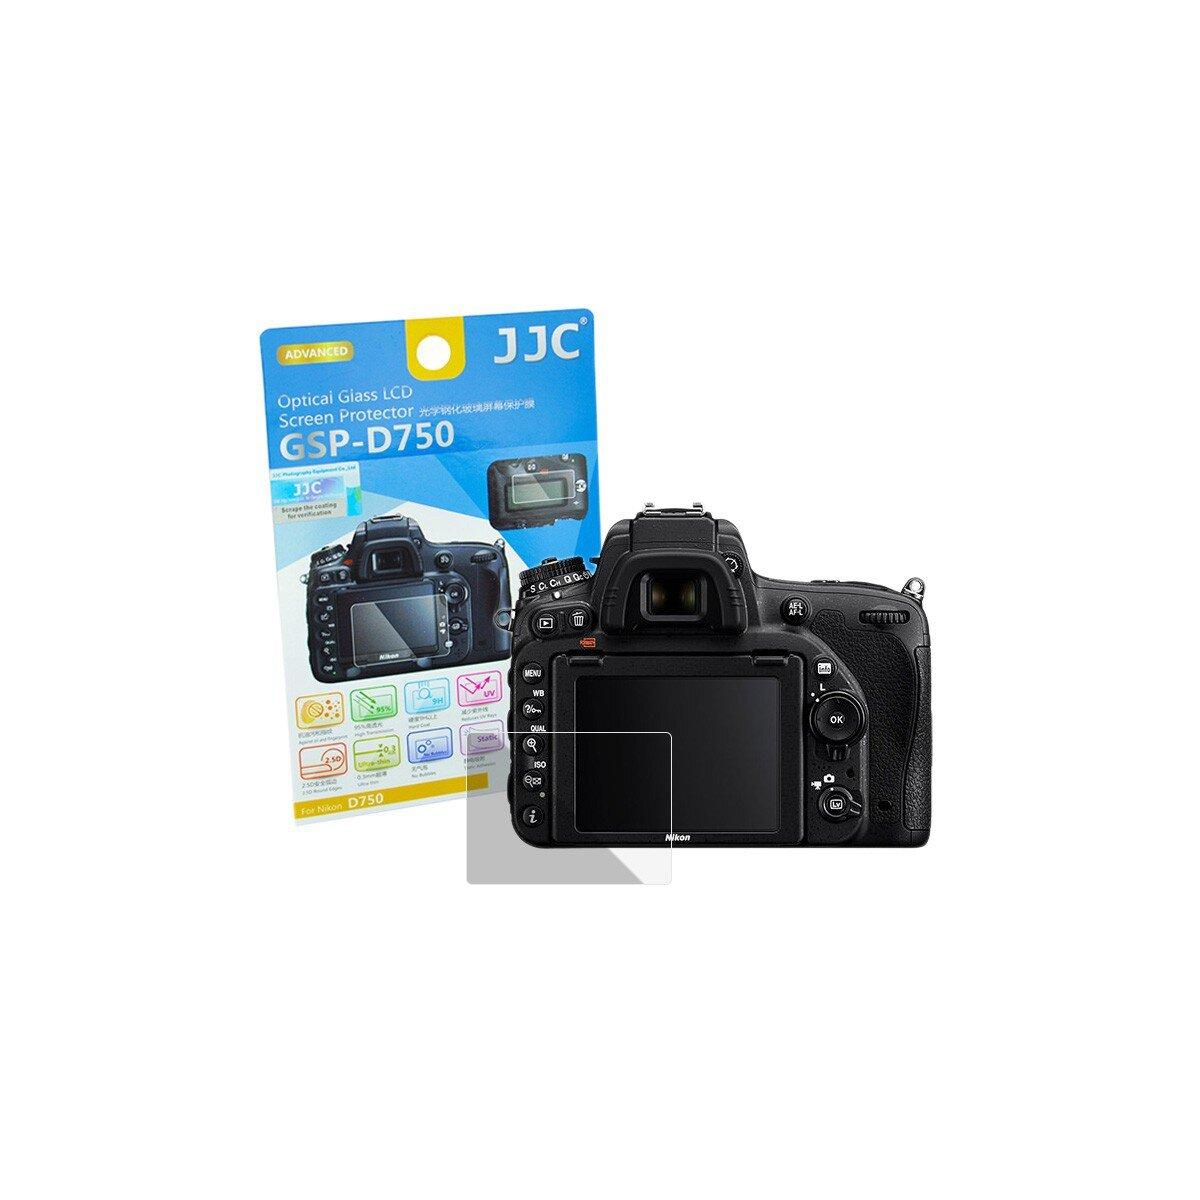 Hochwertiger Displayschutz Screen Protector aus gehaertetem Echtglas, passend fuer Nikon D750 - JJC GSP-D750